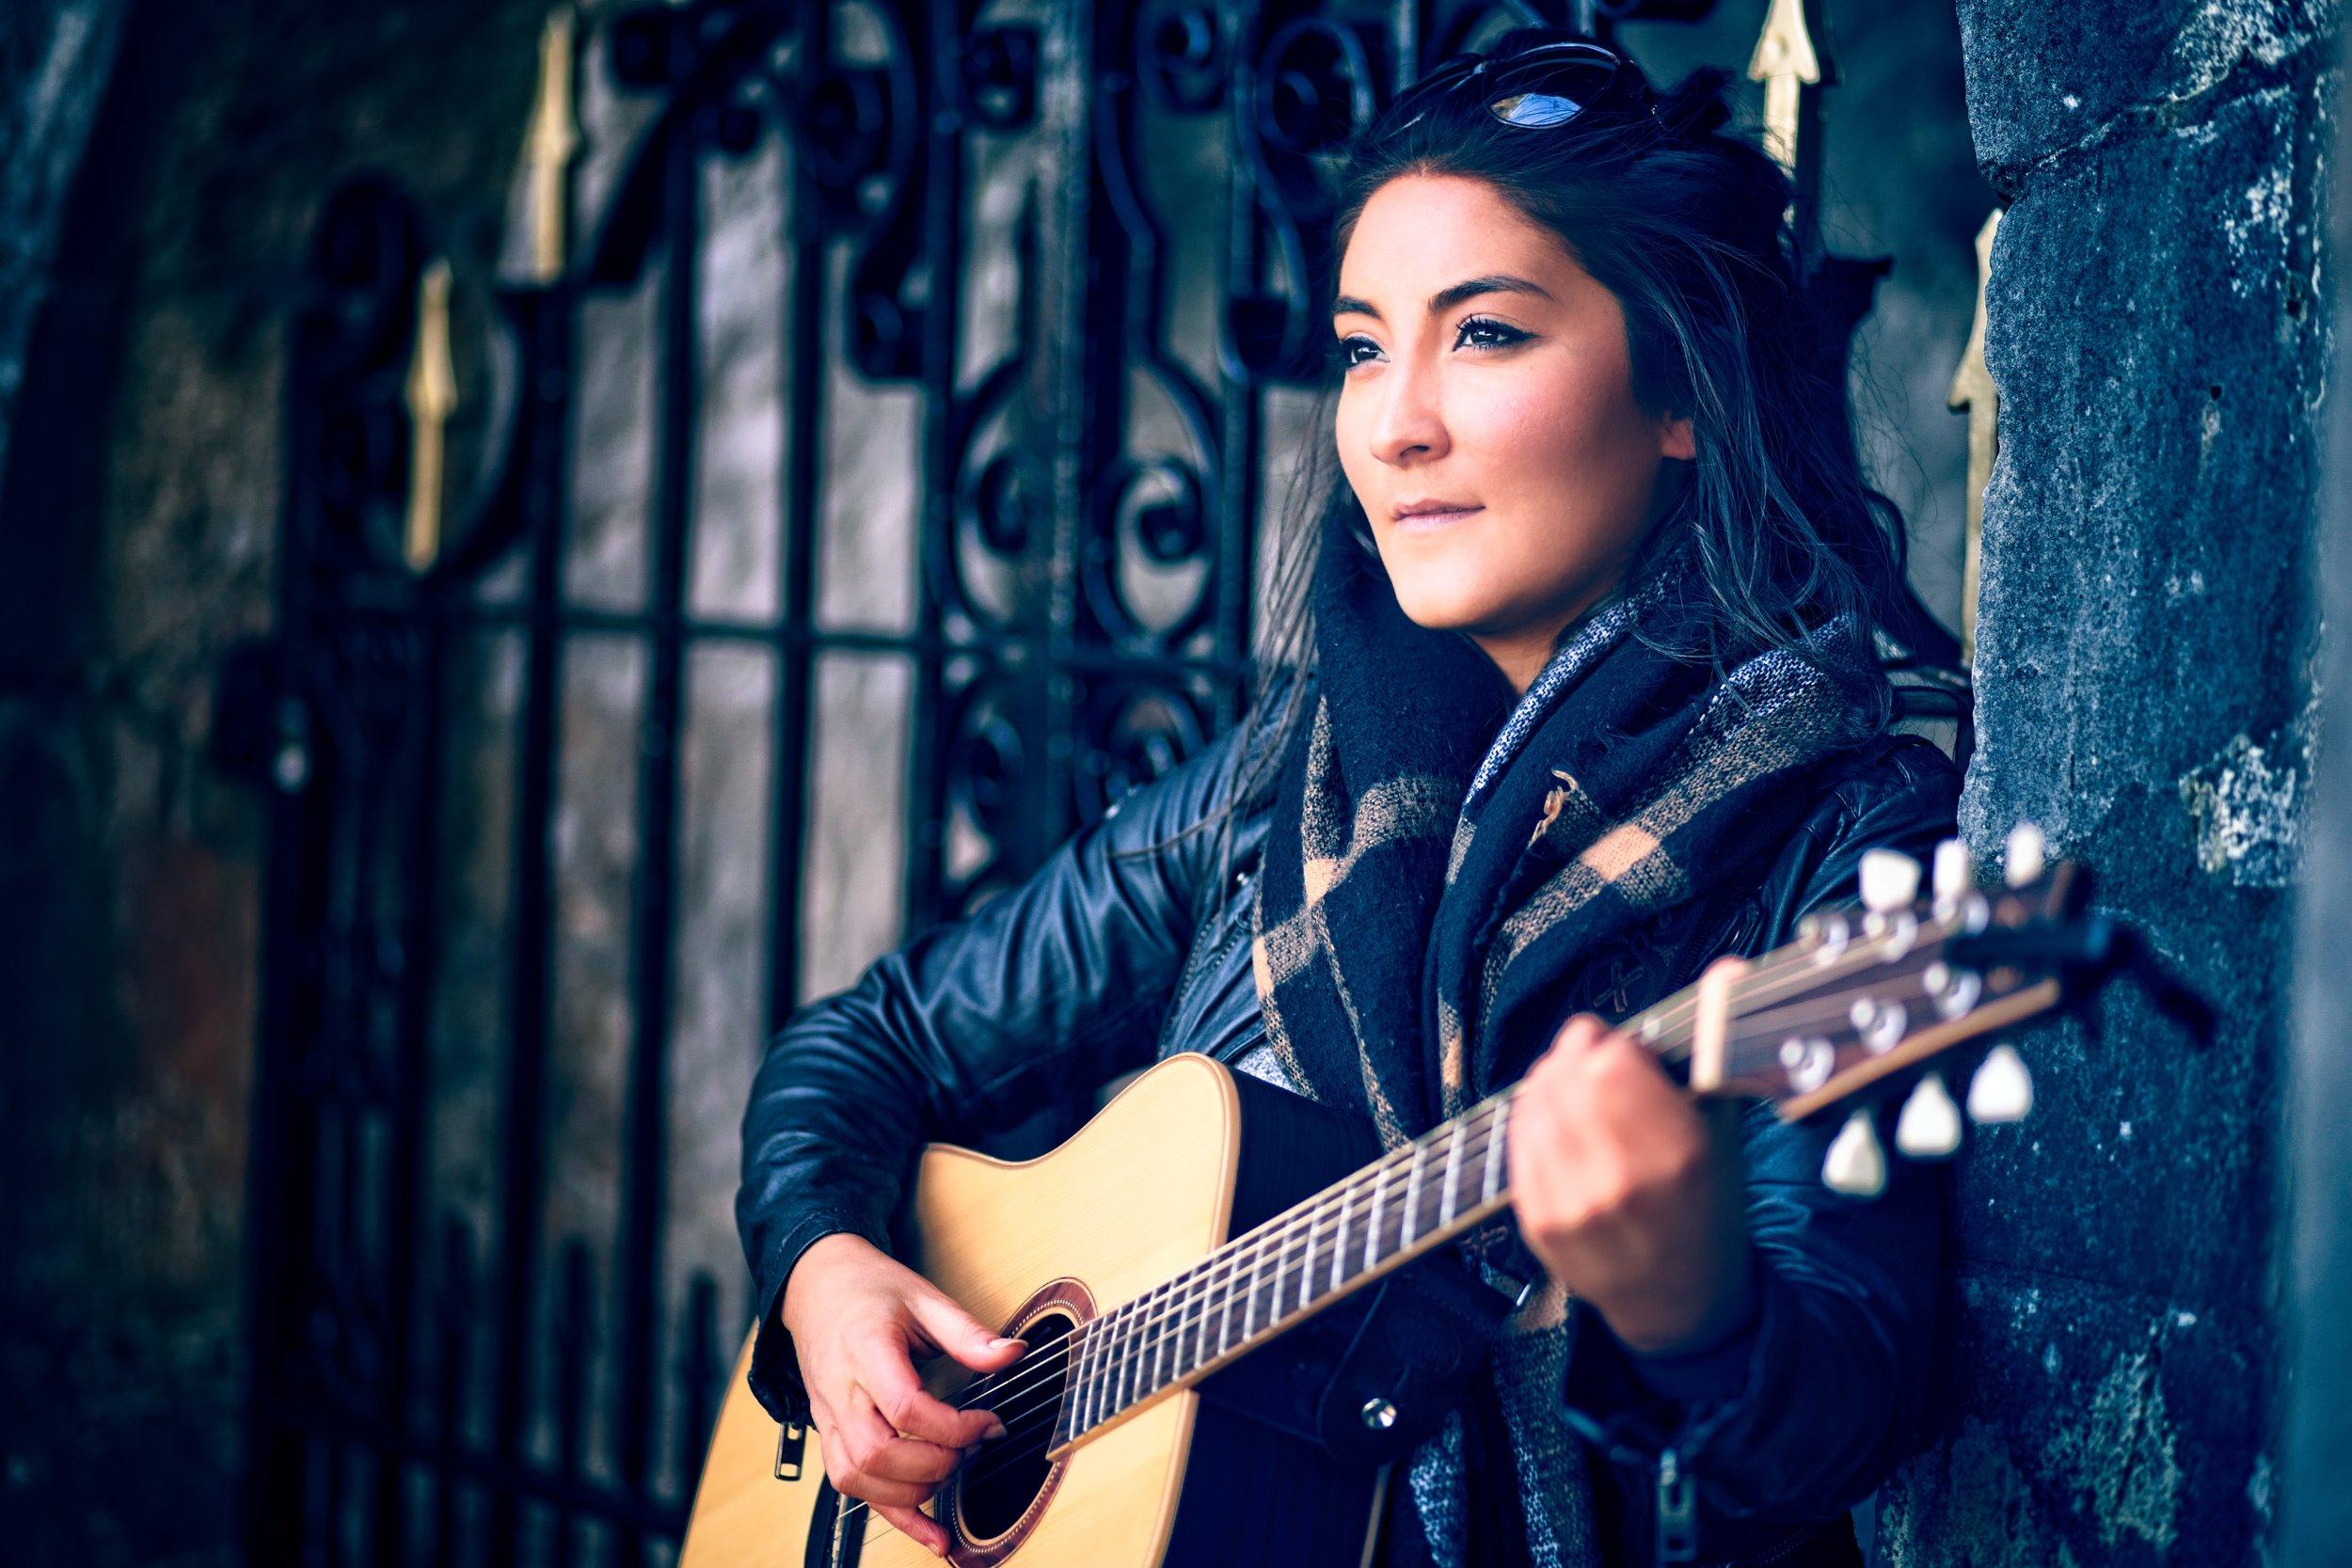 Pari performs beautiful vocals and acoustic accompaniment